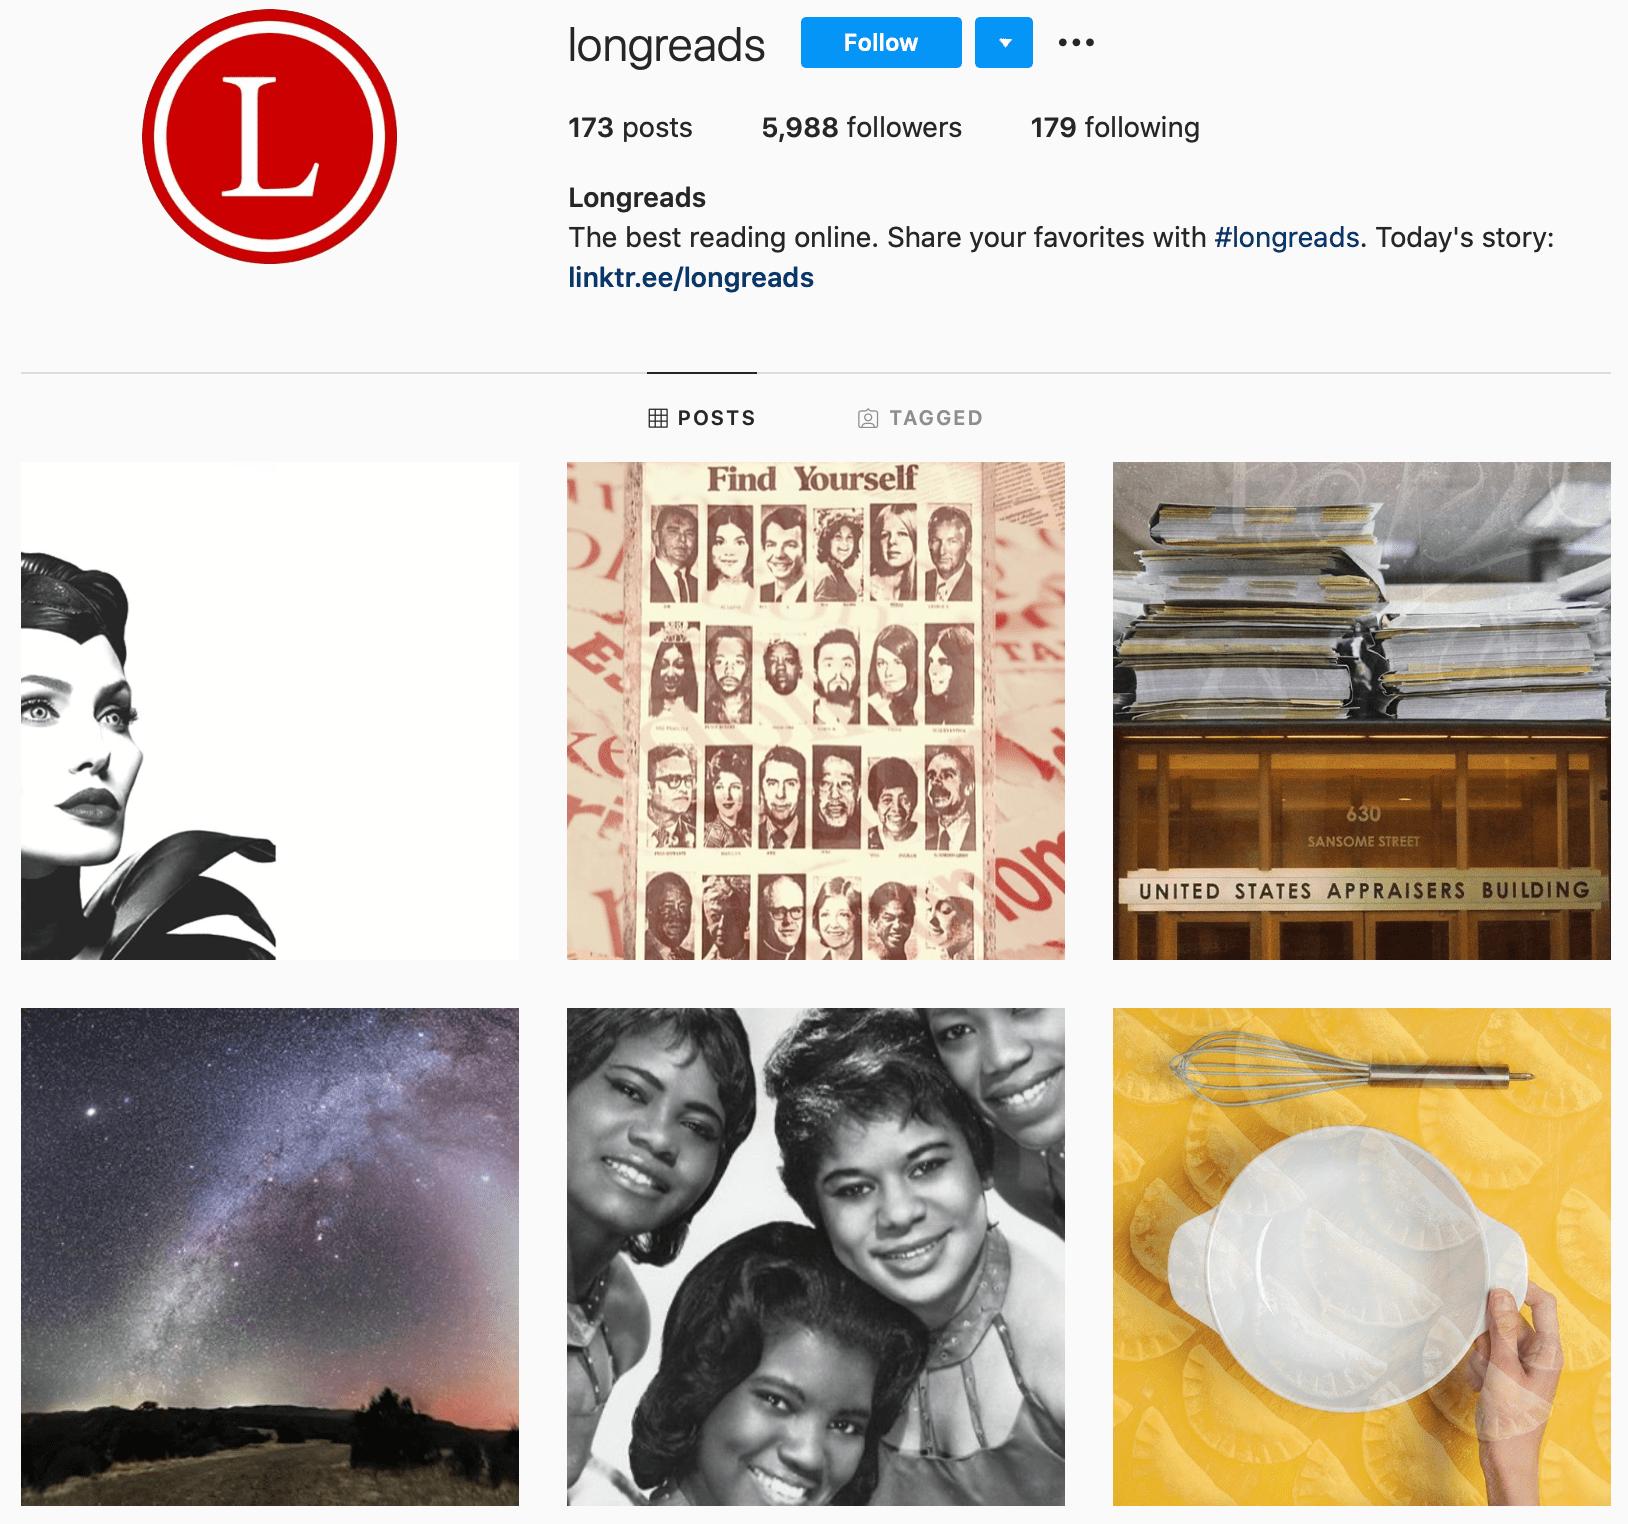 longreads instagram profile photo